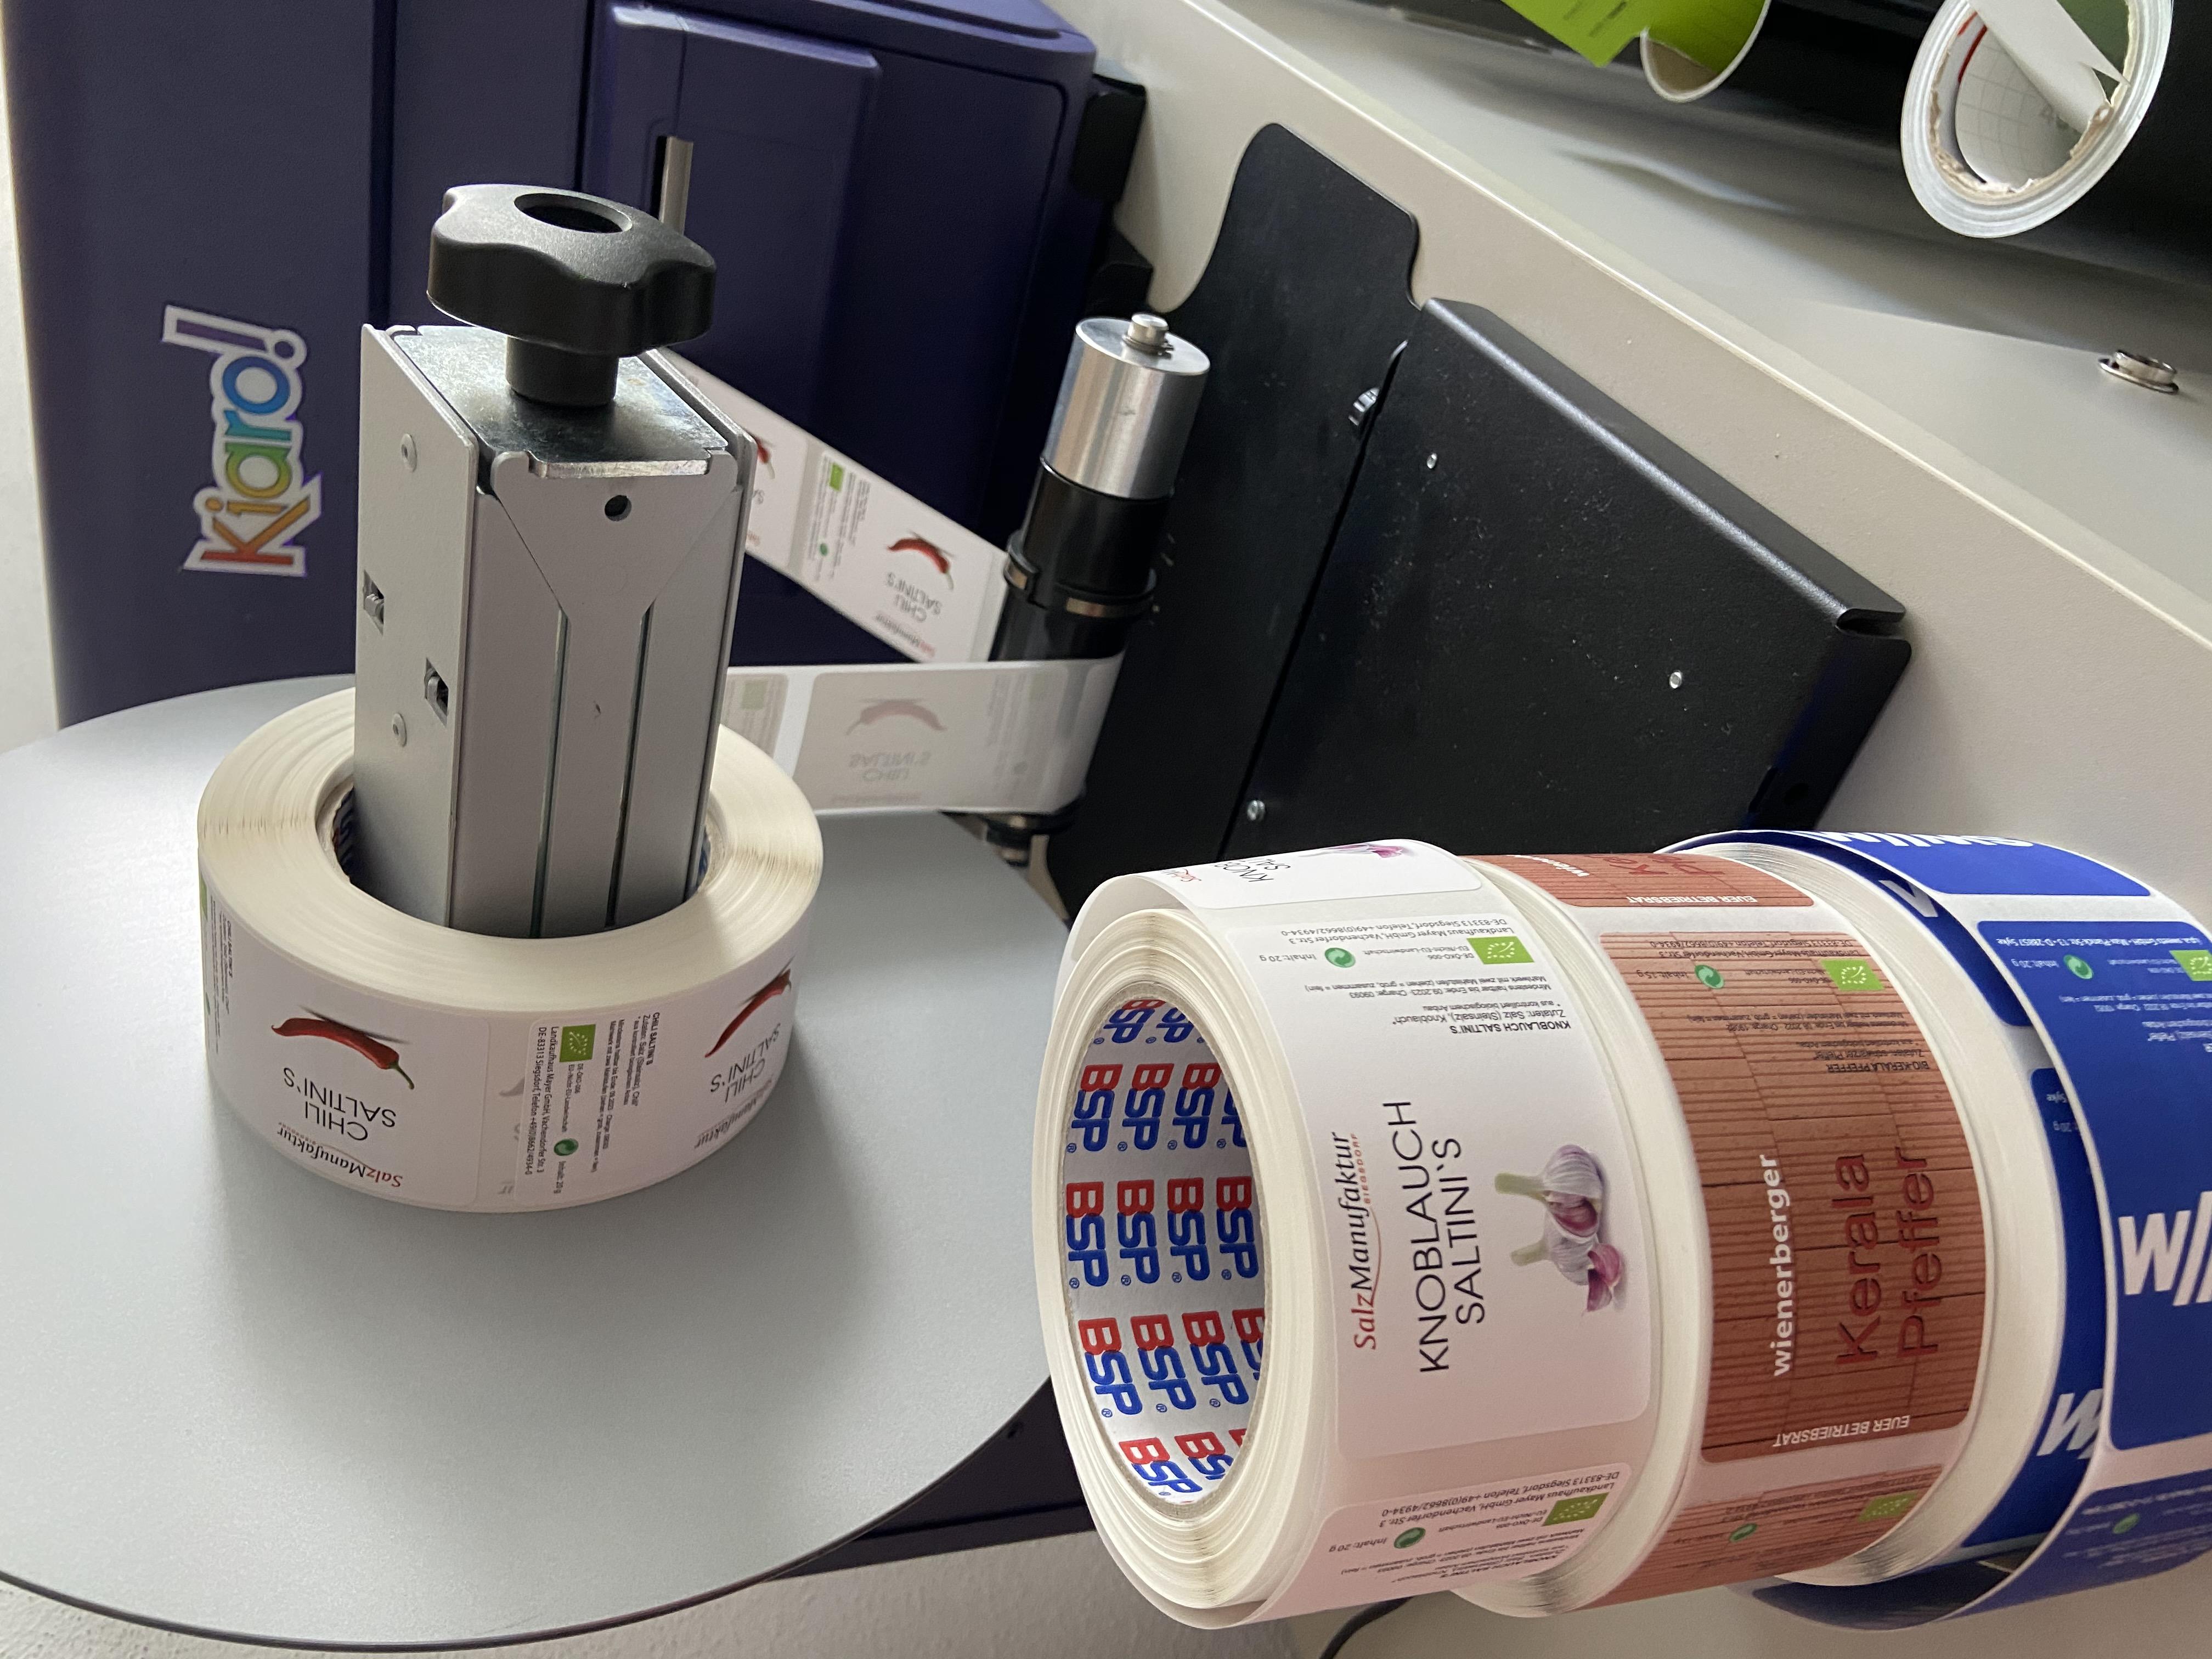 Kiaro Etikettendrucker